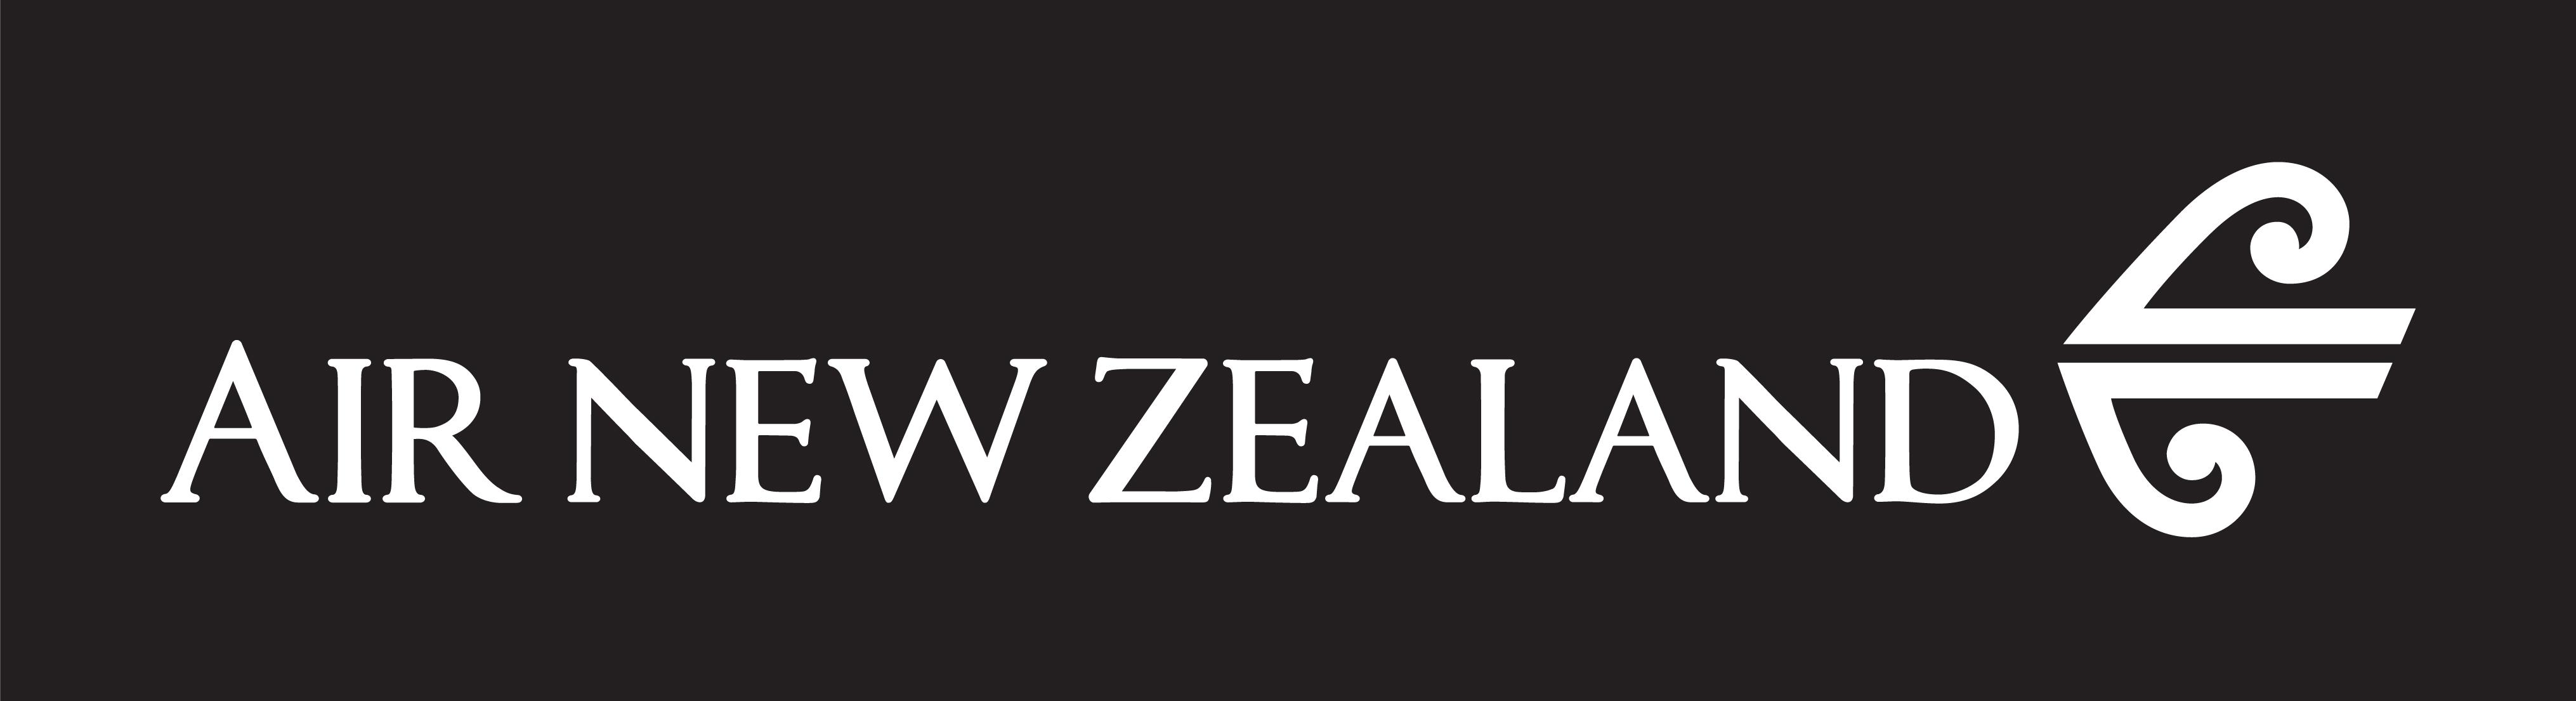 Air New Zealand - Air New Zealand PNG - Air New Zealand Vector PNG